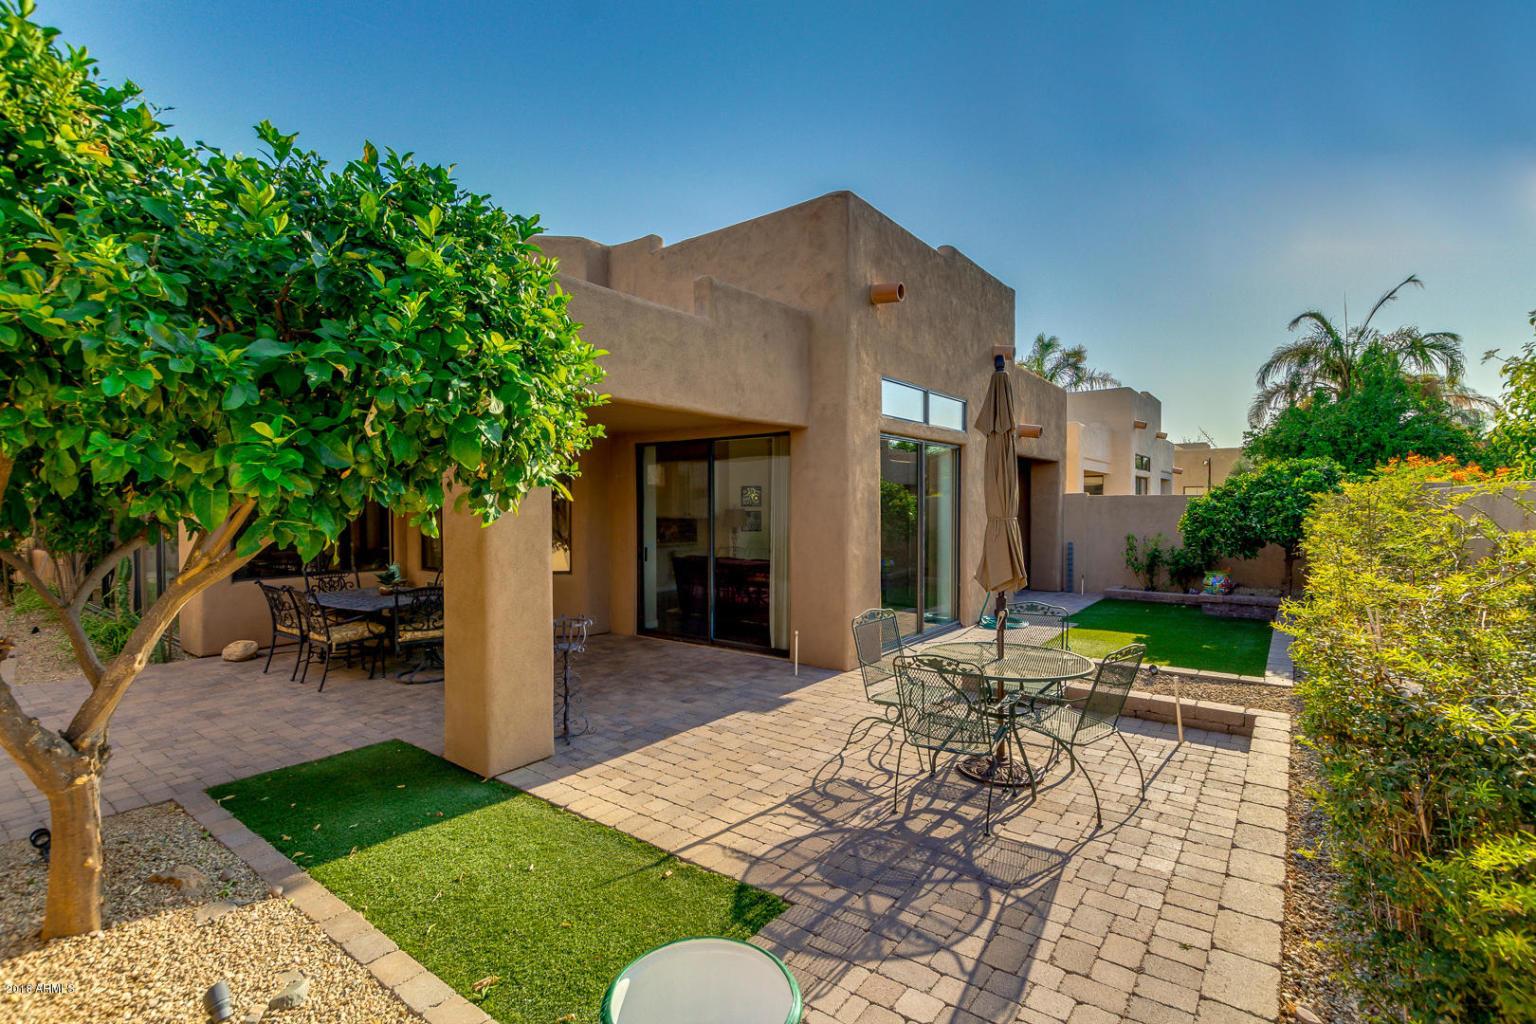 8360 E Cactus Wren Rd, Scottsdale | $565,000